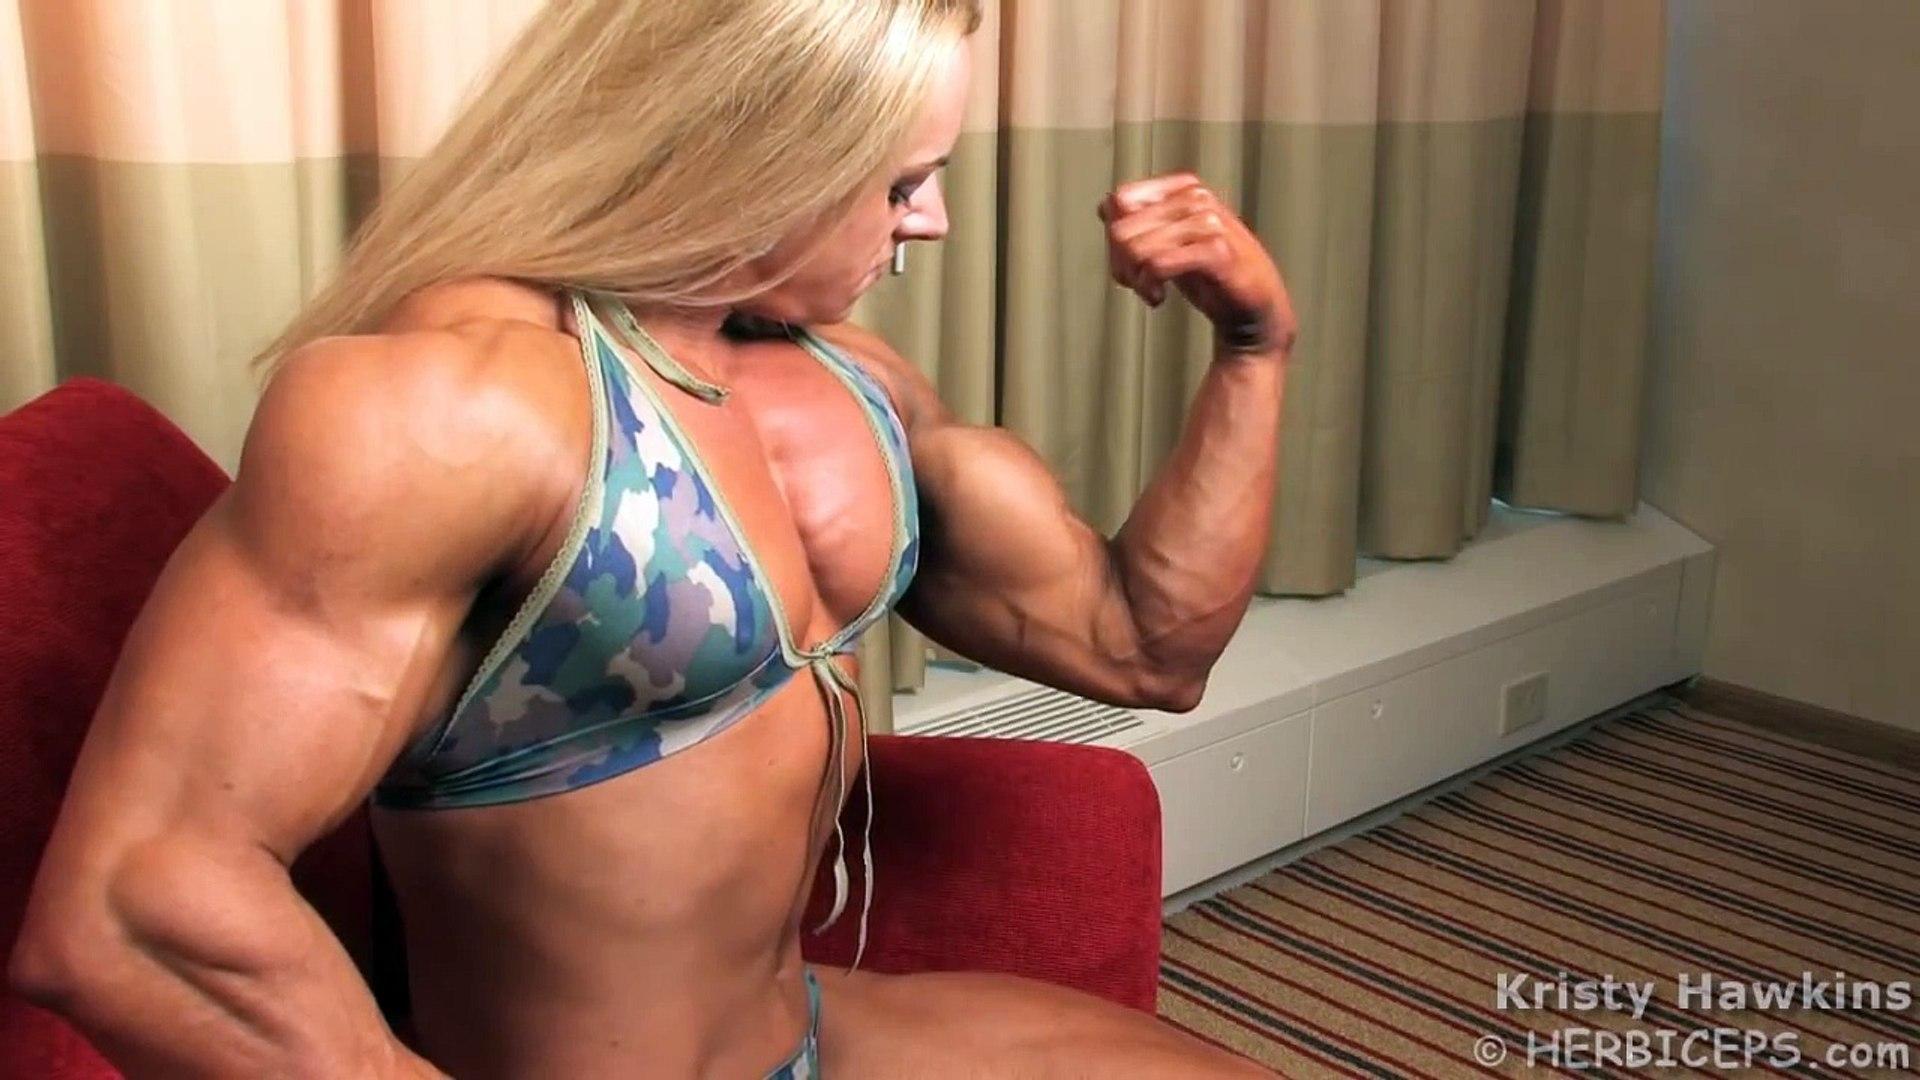 KRISTY HAWKINS - FLEXING UNBELIEVABLE ARMS - Female Bodybuilding Muscle  Fitness